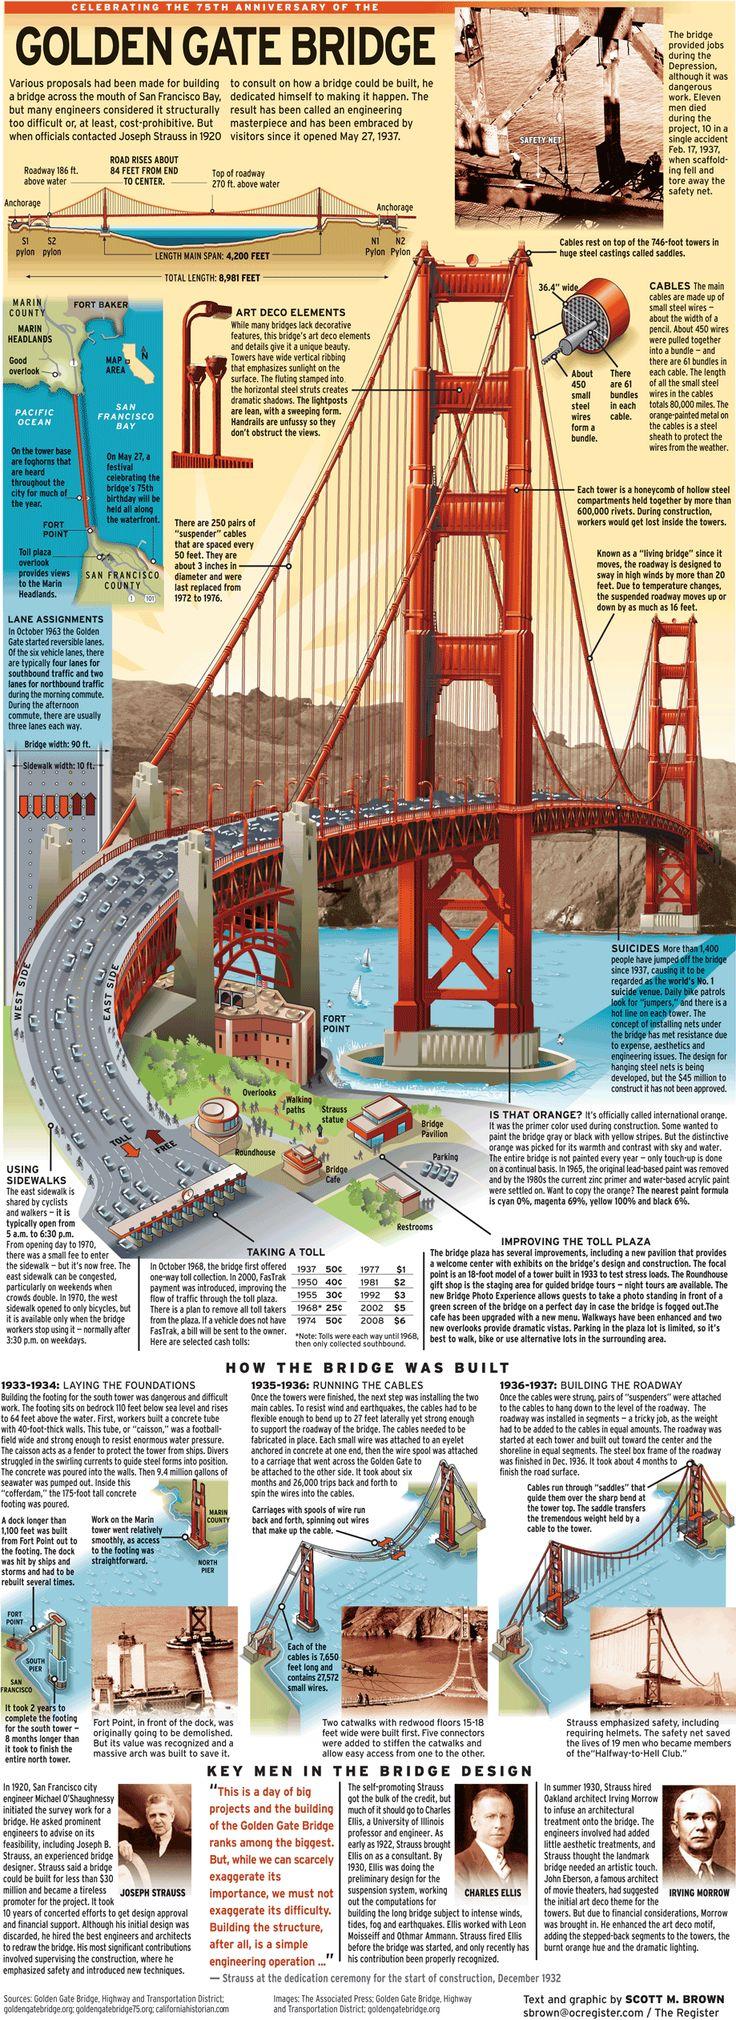 Engineering masterpiece turns 75 | bridge, gate, golden - Golden Gate Bridge - The Orange County Register